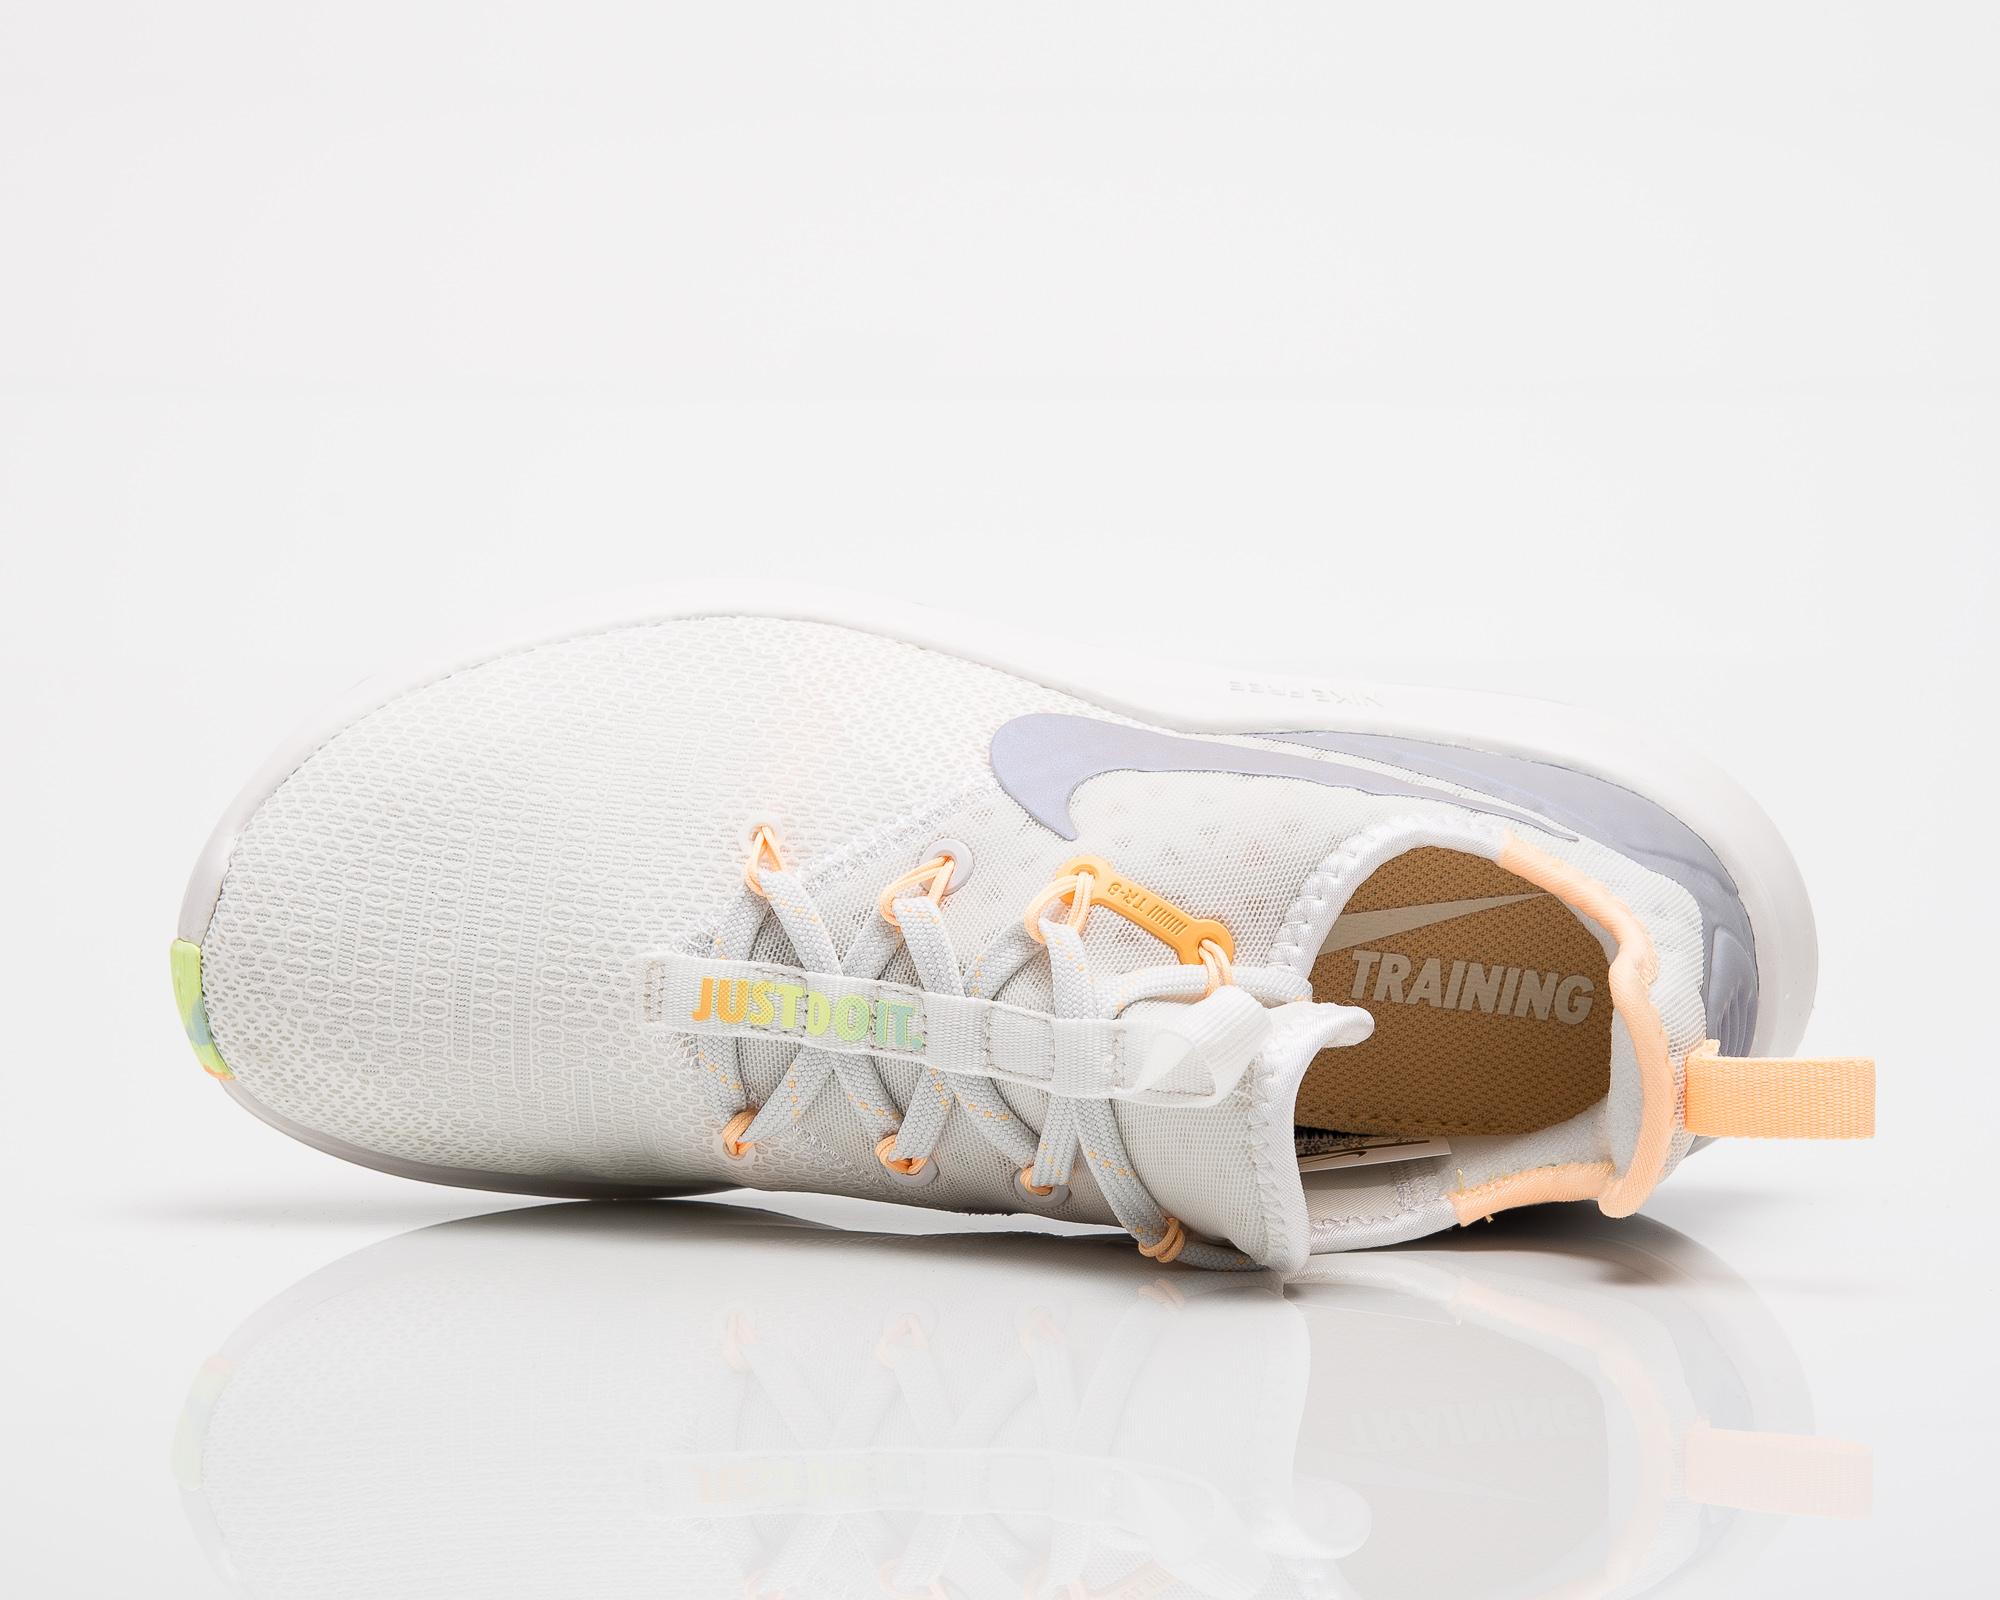 27f91ba8e1c3 Nike Wmns Free TR 8 Rise - Shoes Training - Sporting goods